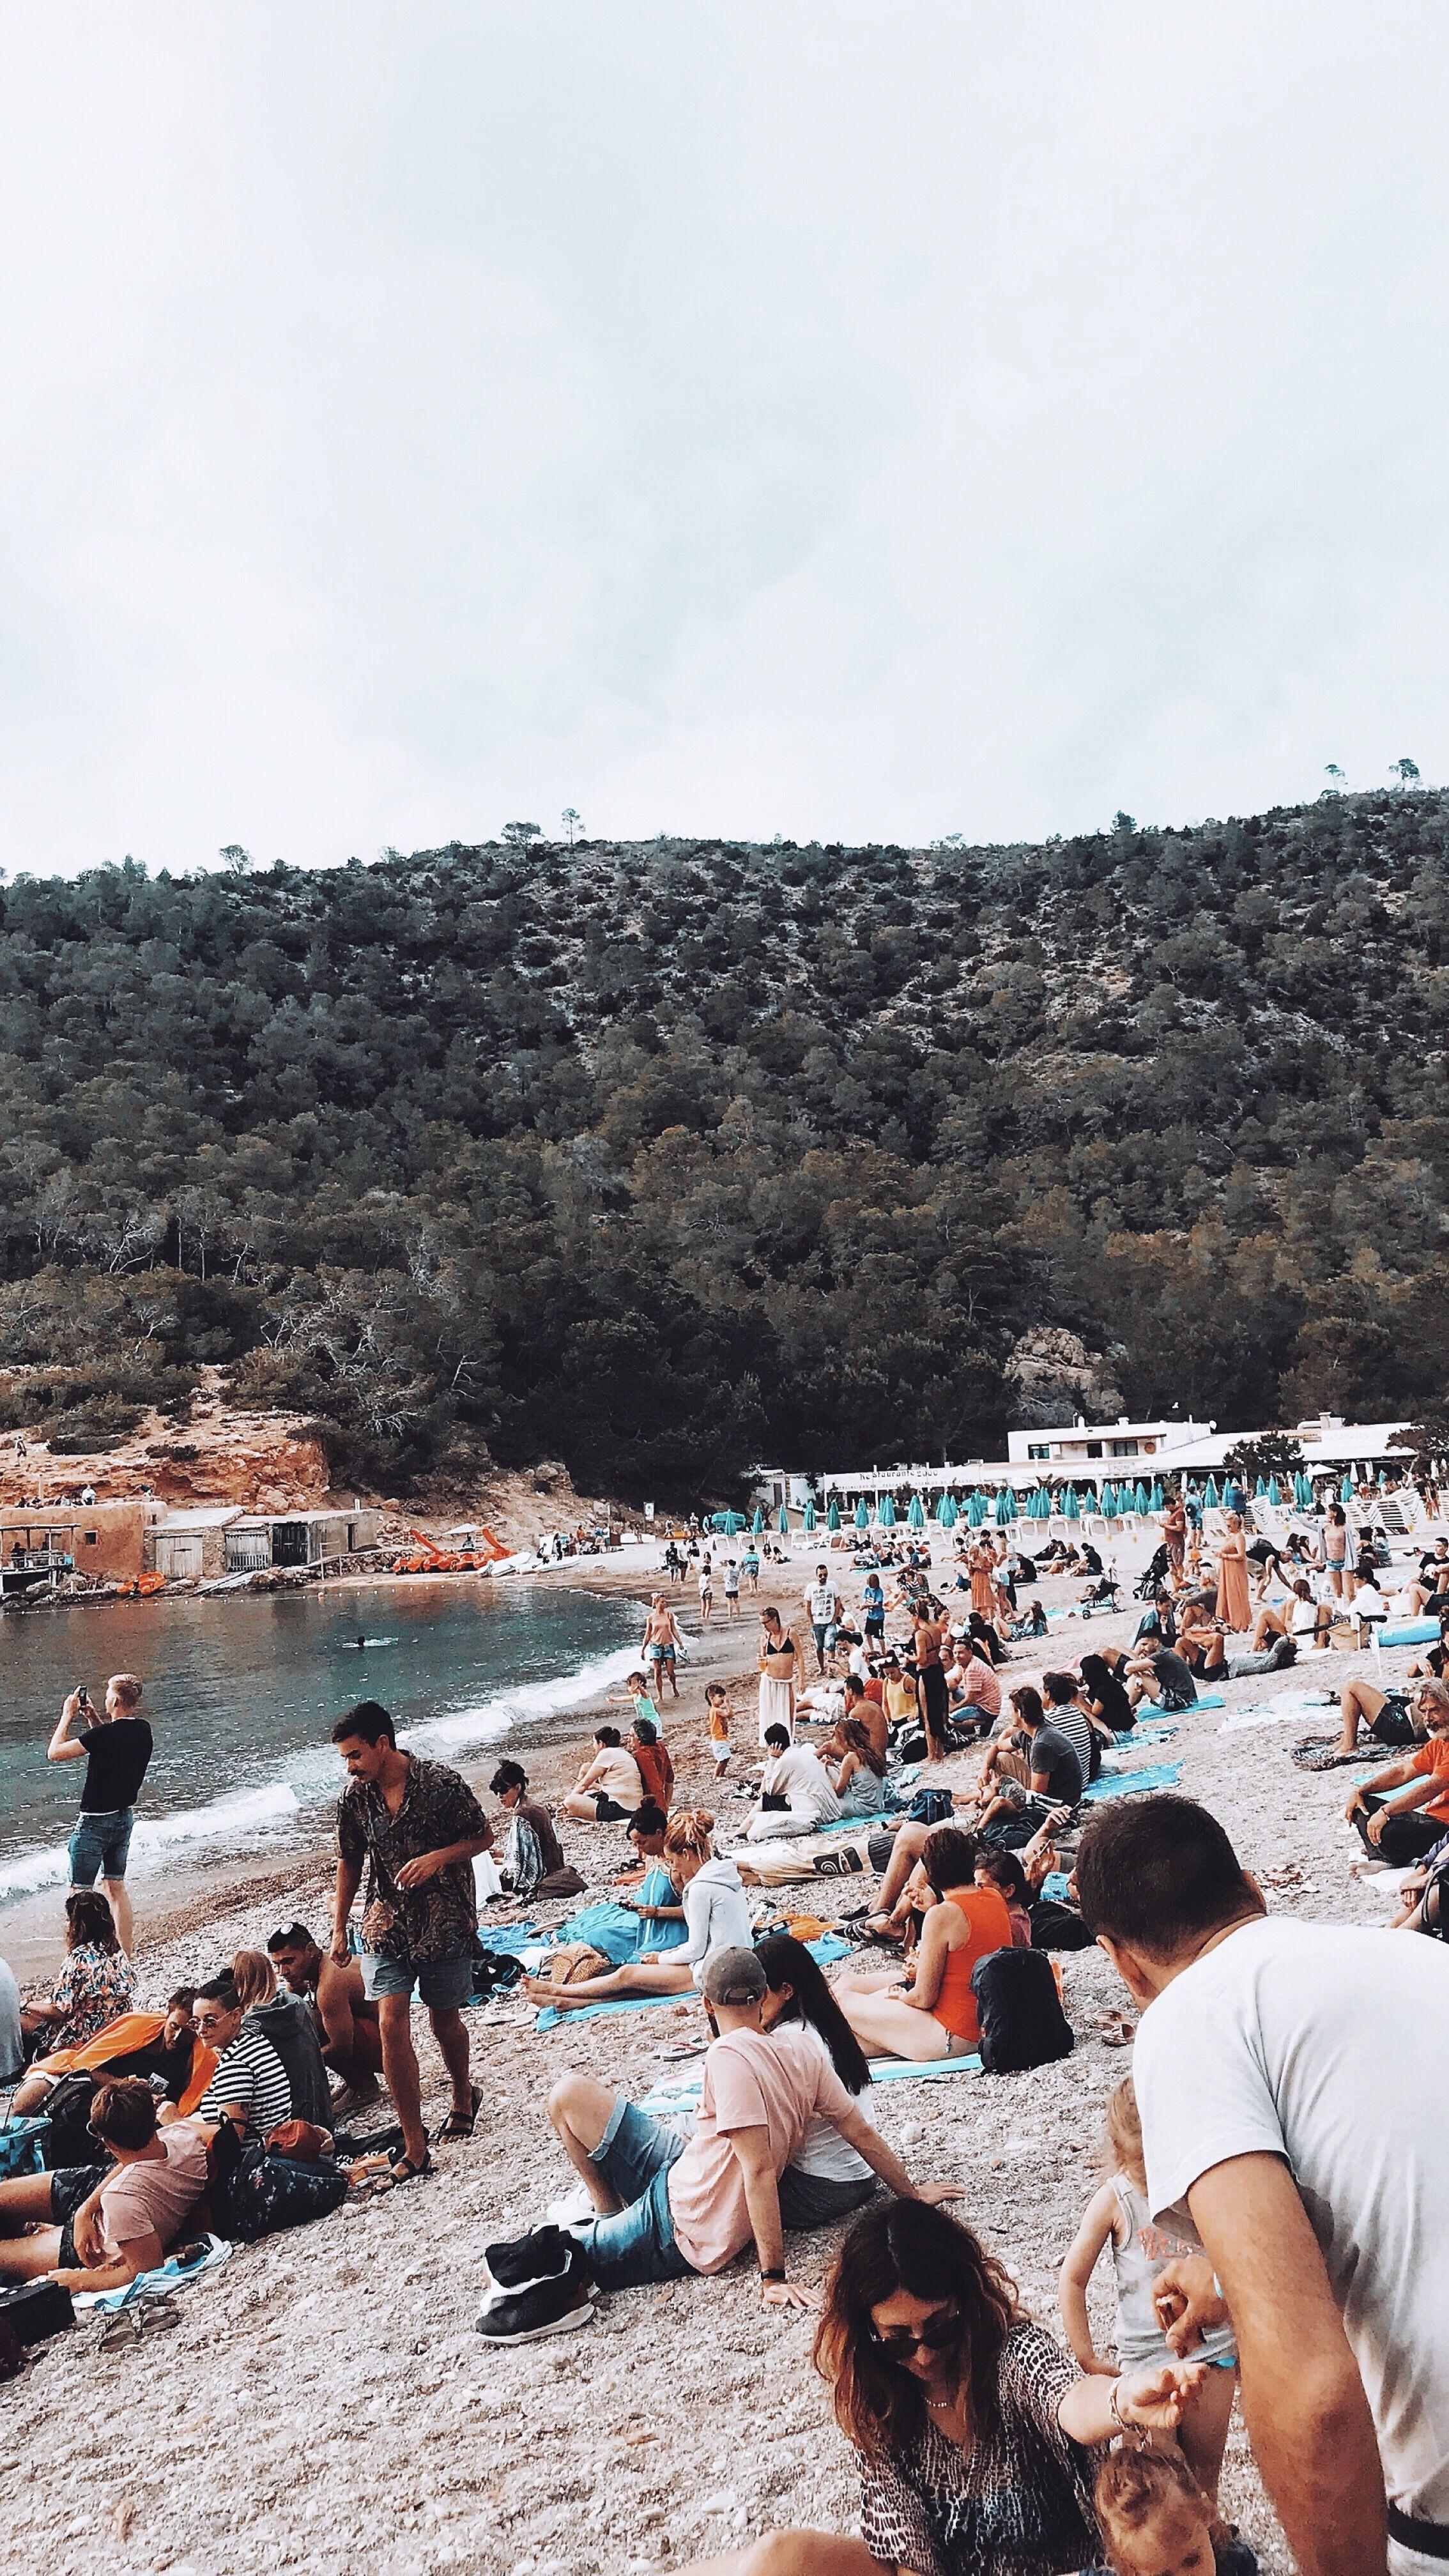 The North Of Ibiza The Giri Cafe Los Enamordados And Elements Seli Muyabo In 2020 Ibiza Travel Ibiza Beautiful Sunset